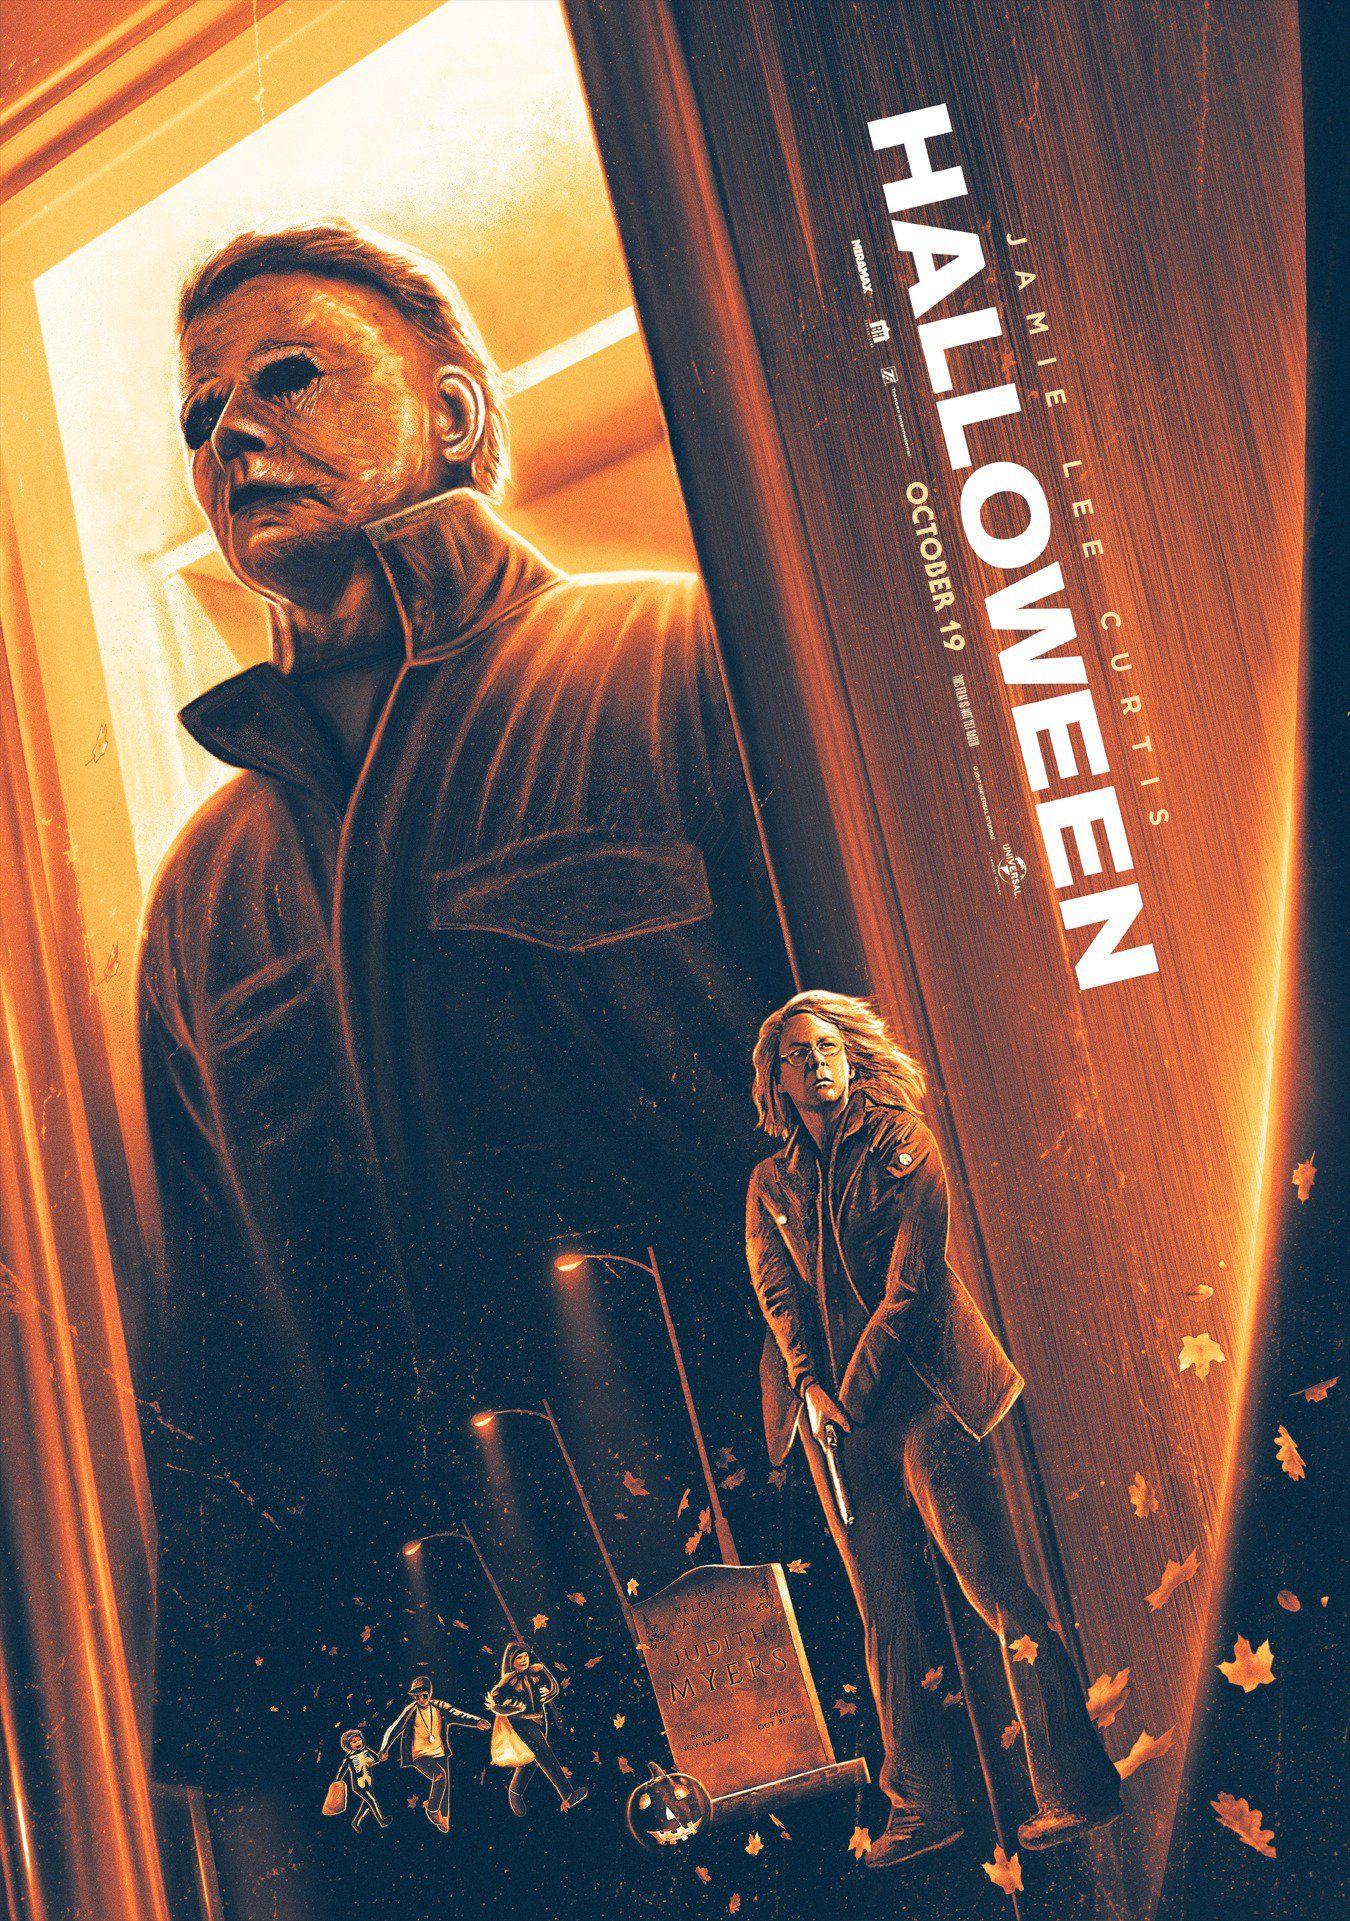 Halloween USA, 2018 updated with John Carpenter score